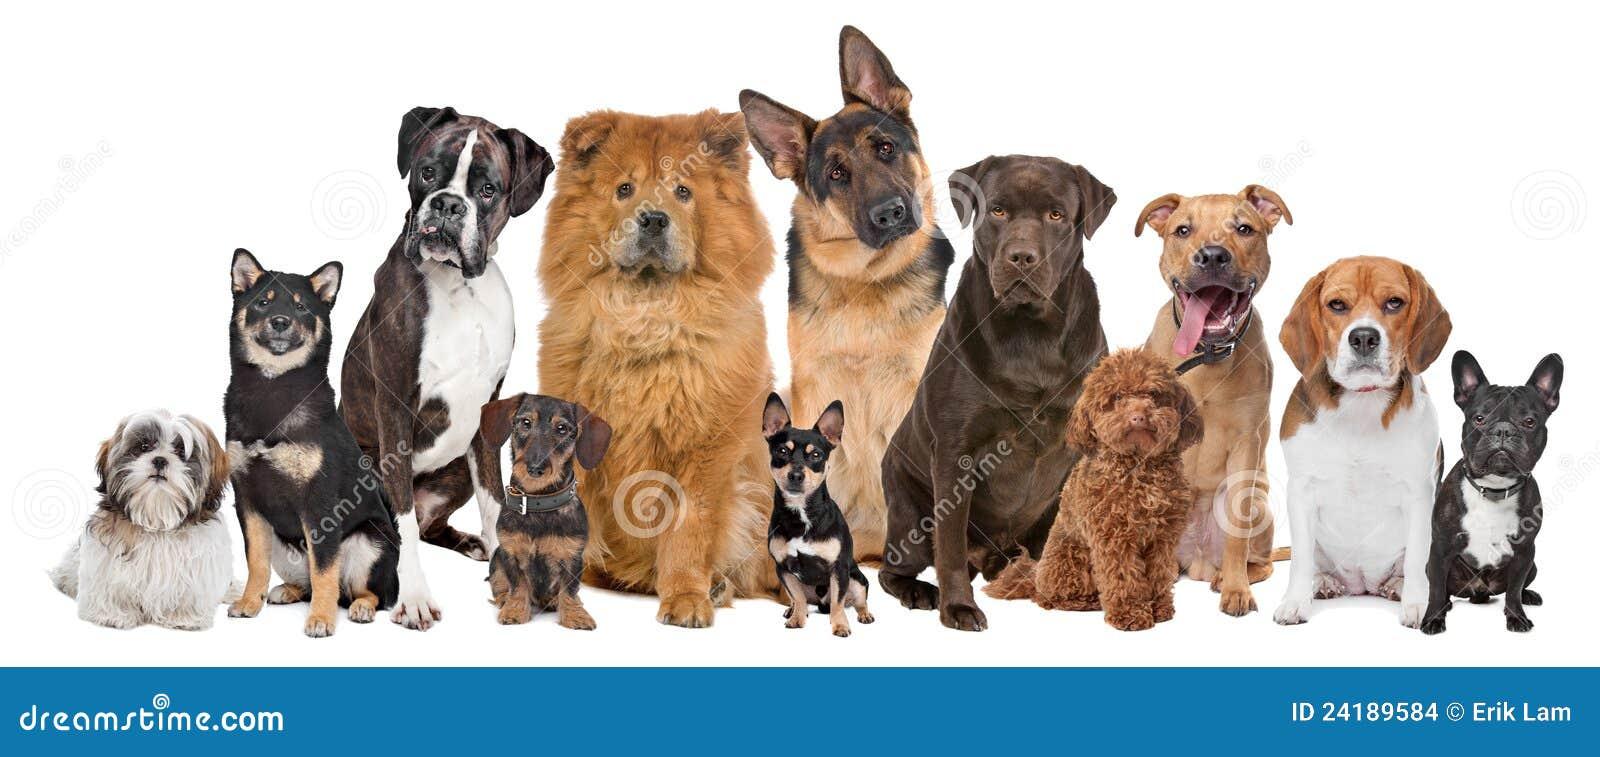 Best Dog Breeds For Multiple Dogs